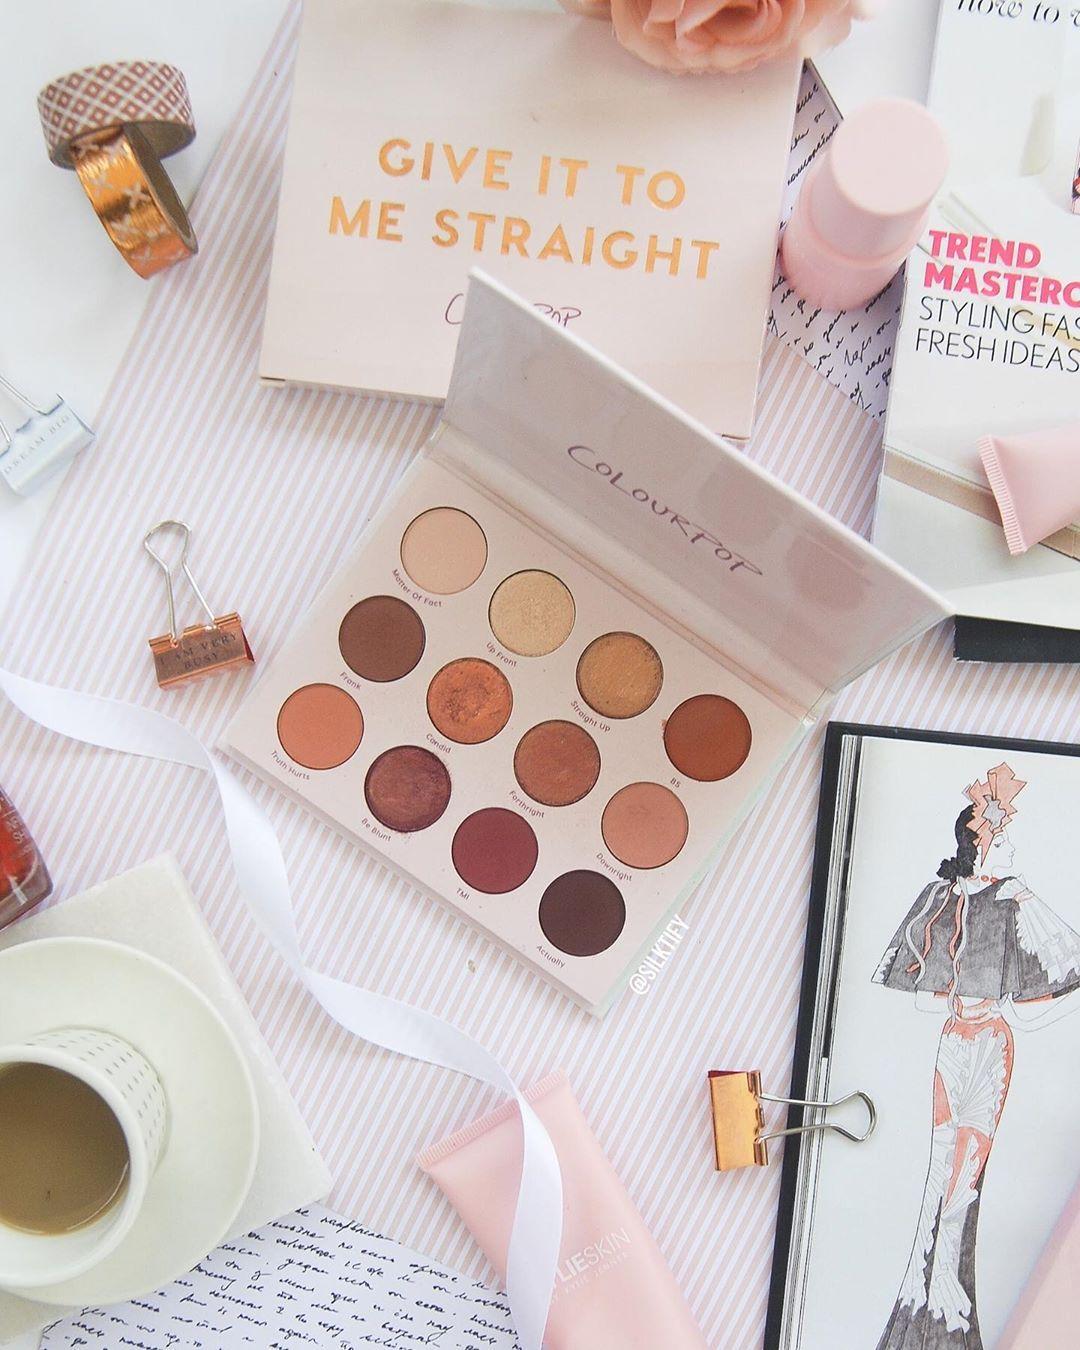 Colourpop eyeshadow palette pastel pink flatlay